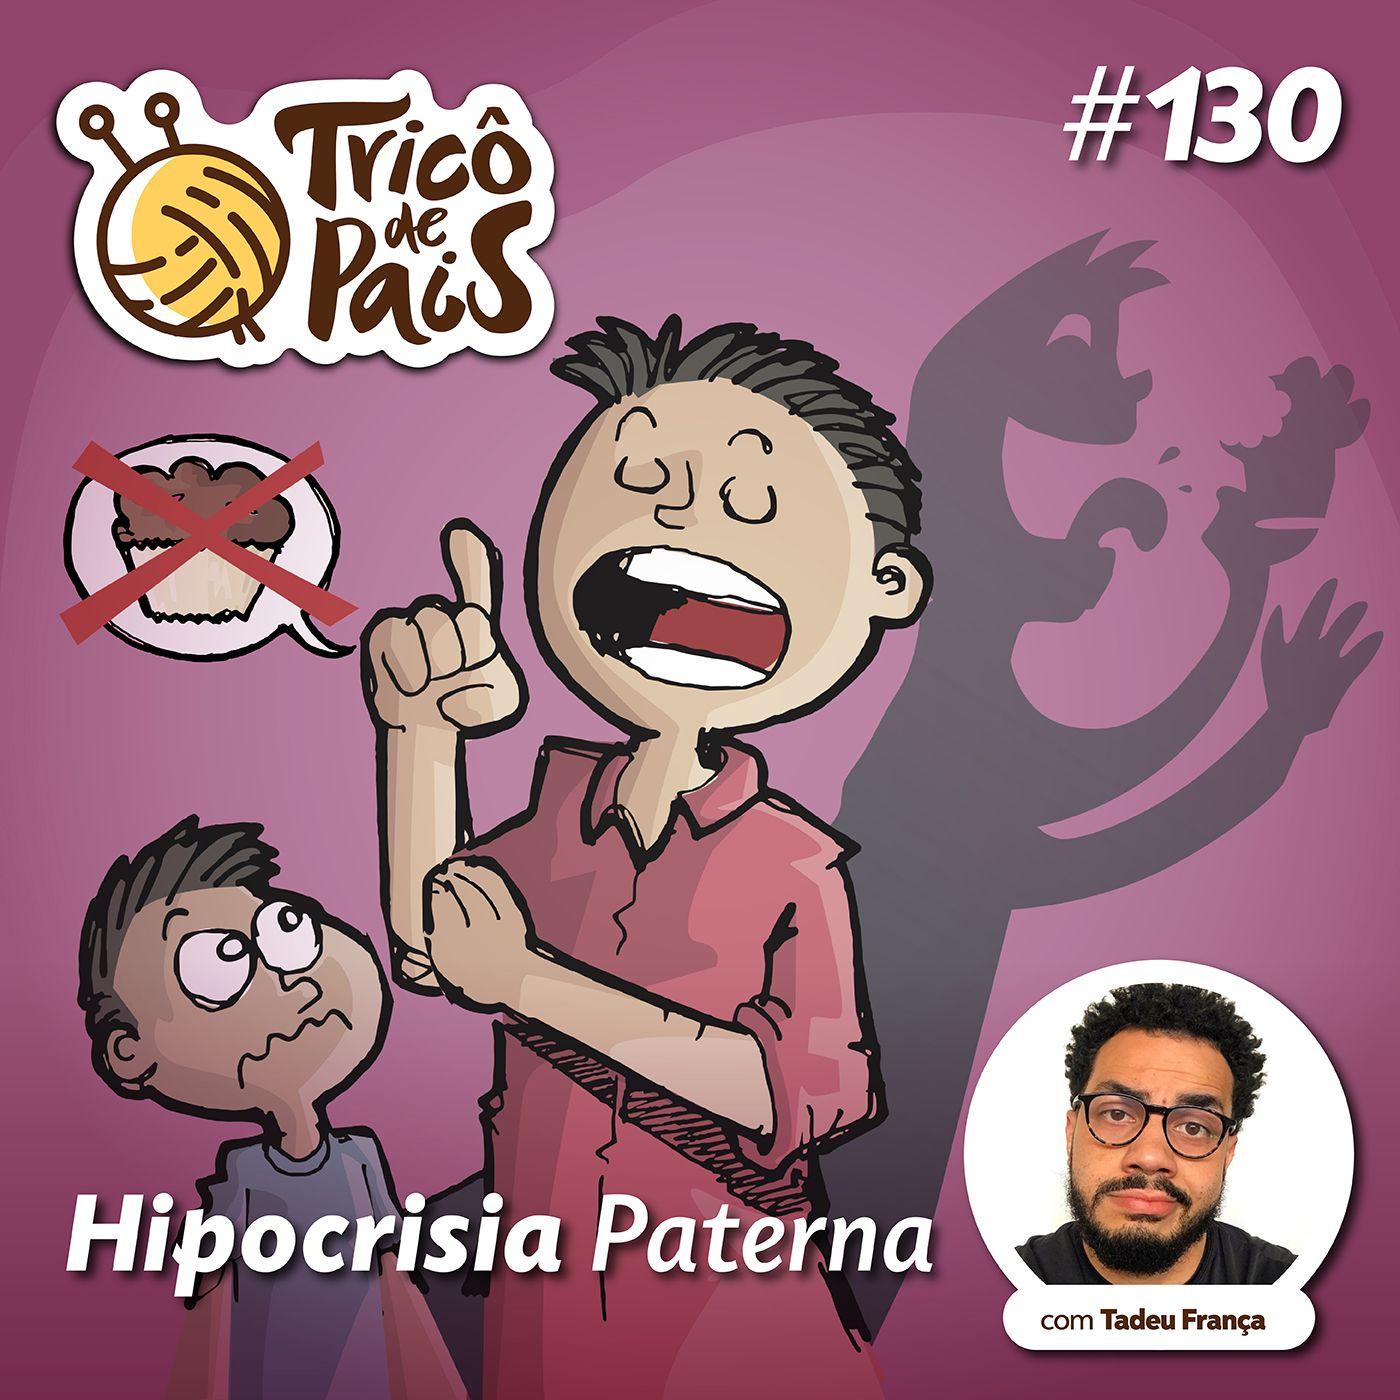 #130 - Hipocrisia Paterna